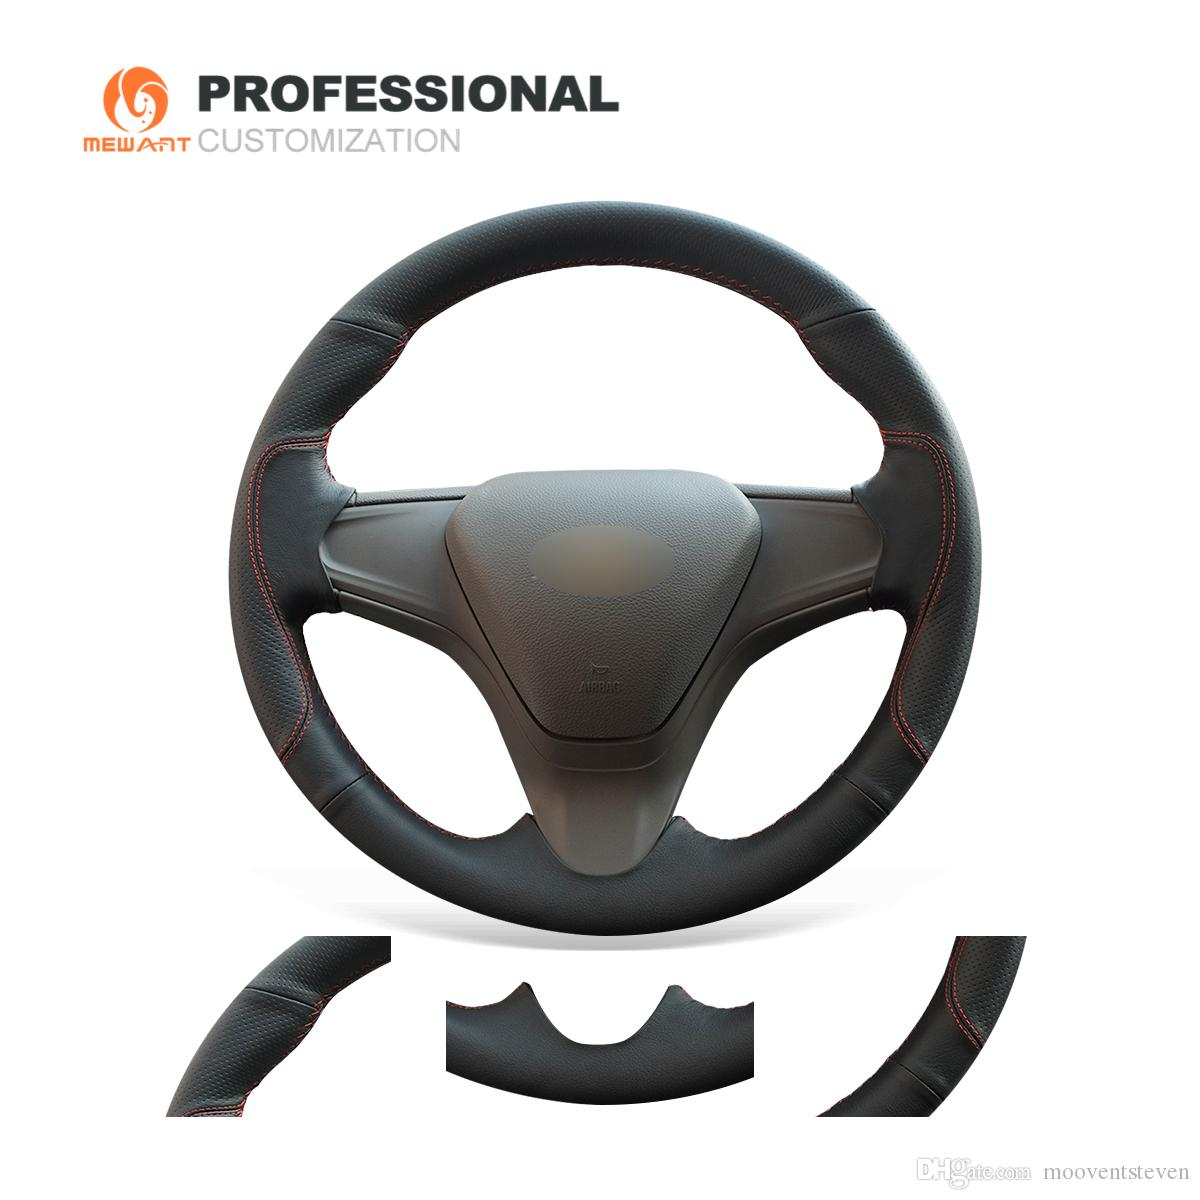 Mewant Custom Diy Black Genuine Leather Steering Wheel Cover Wrap For Chevrolet Cruze 2015 2016 2017 2018 2019